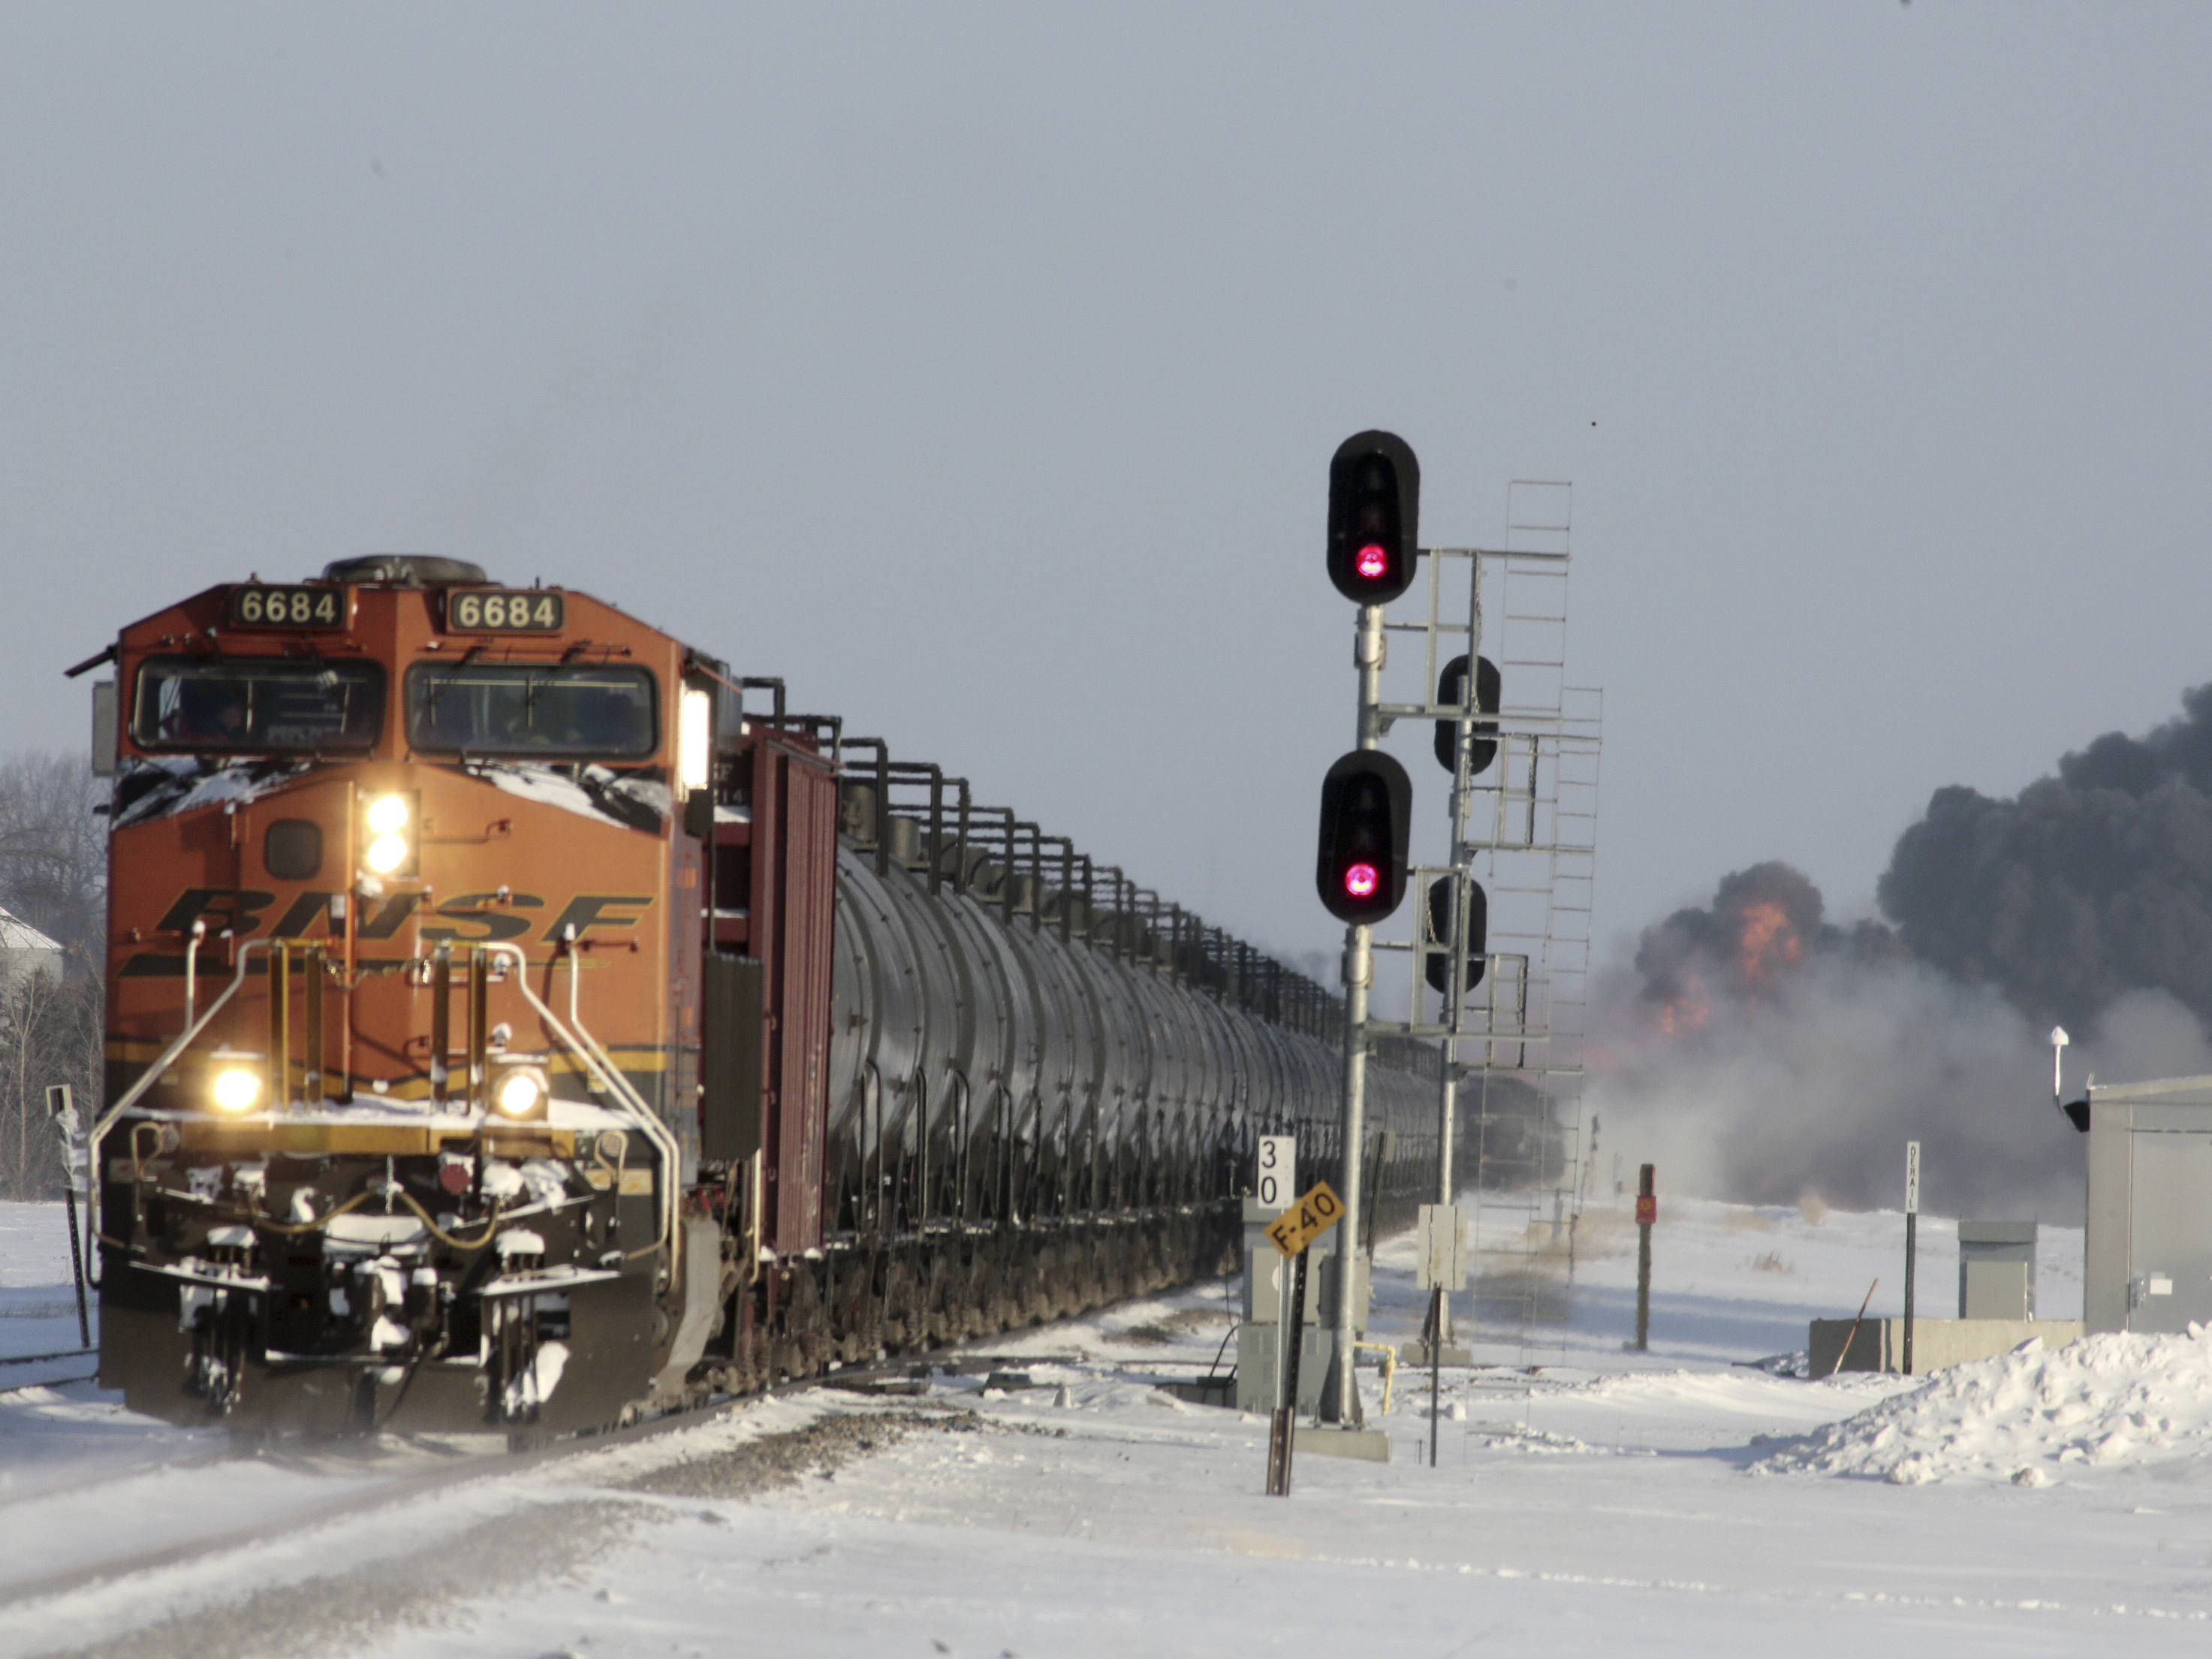 Train Derailment In North Dakota Causes Explosion, Fire